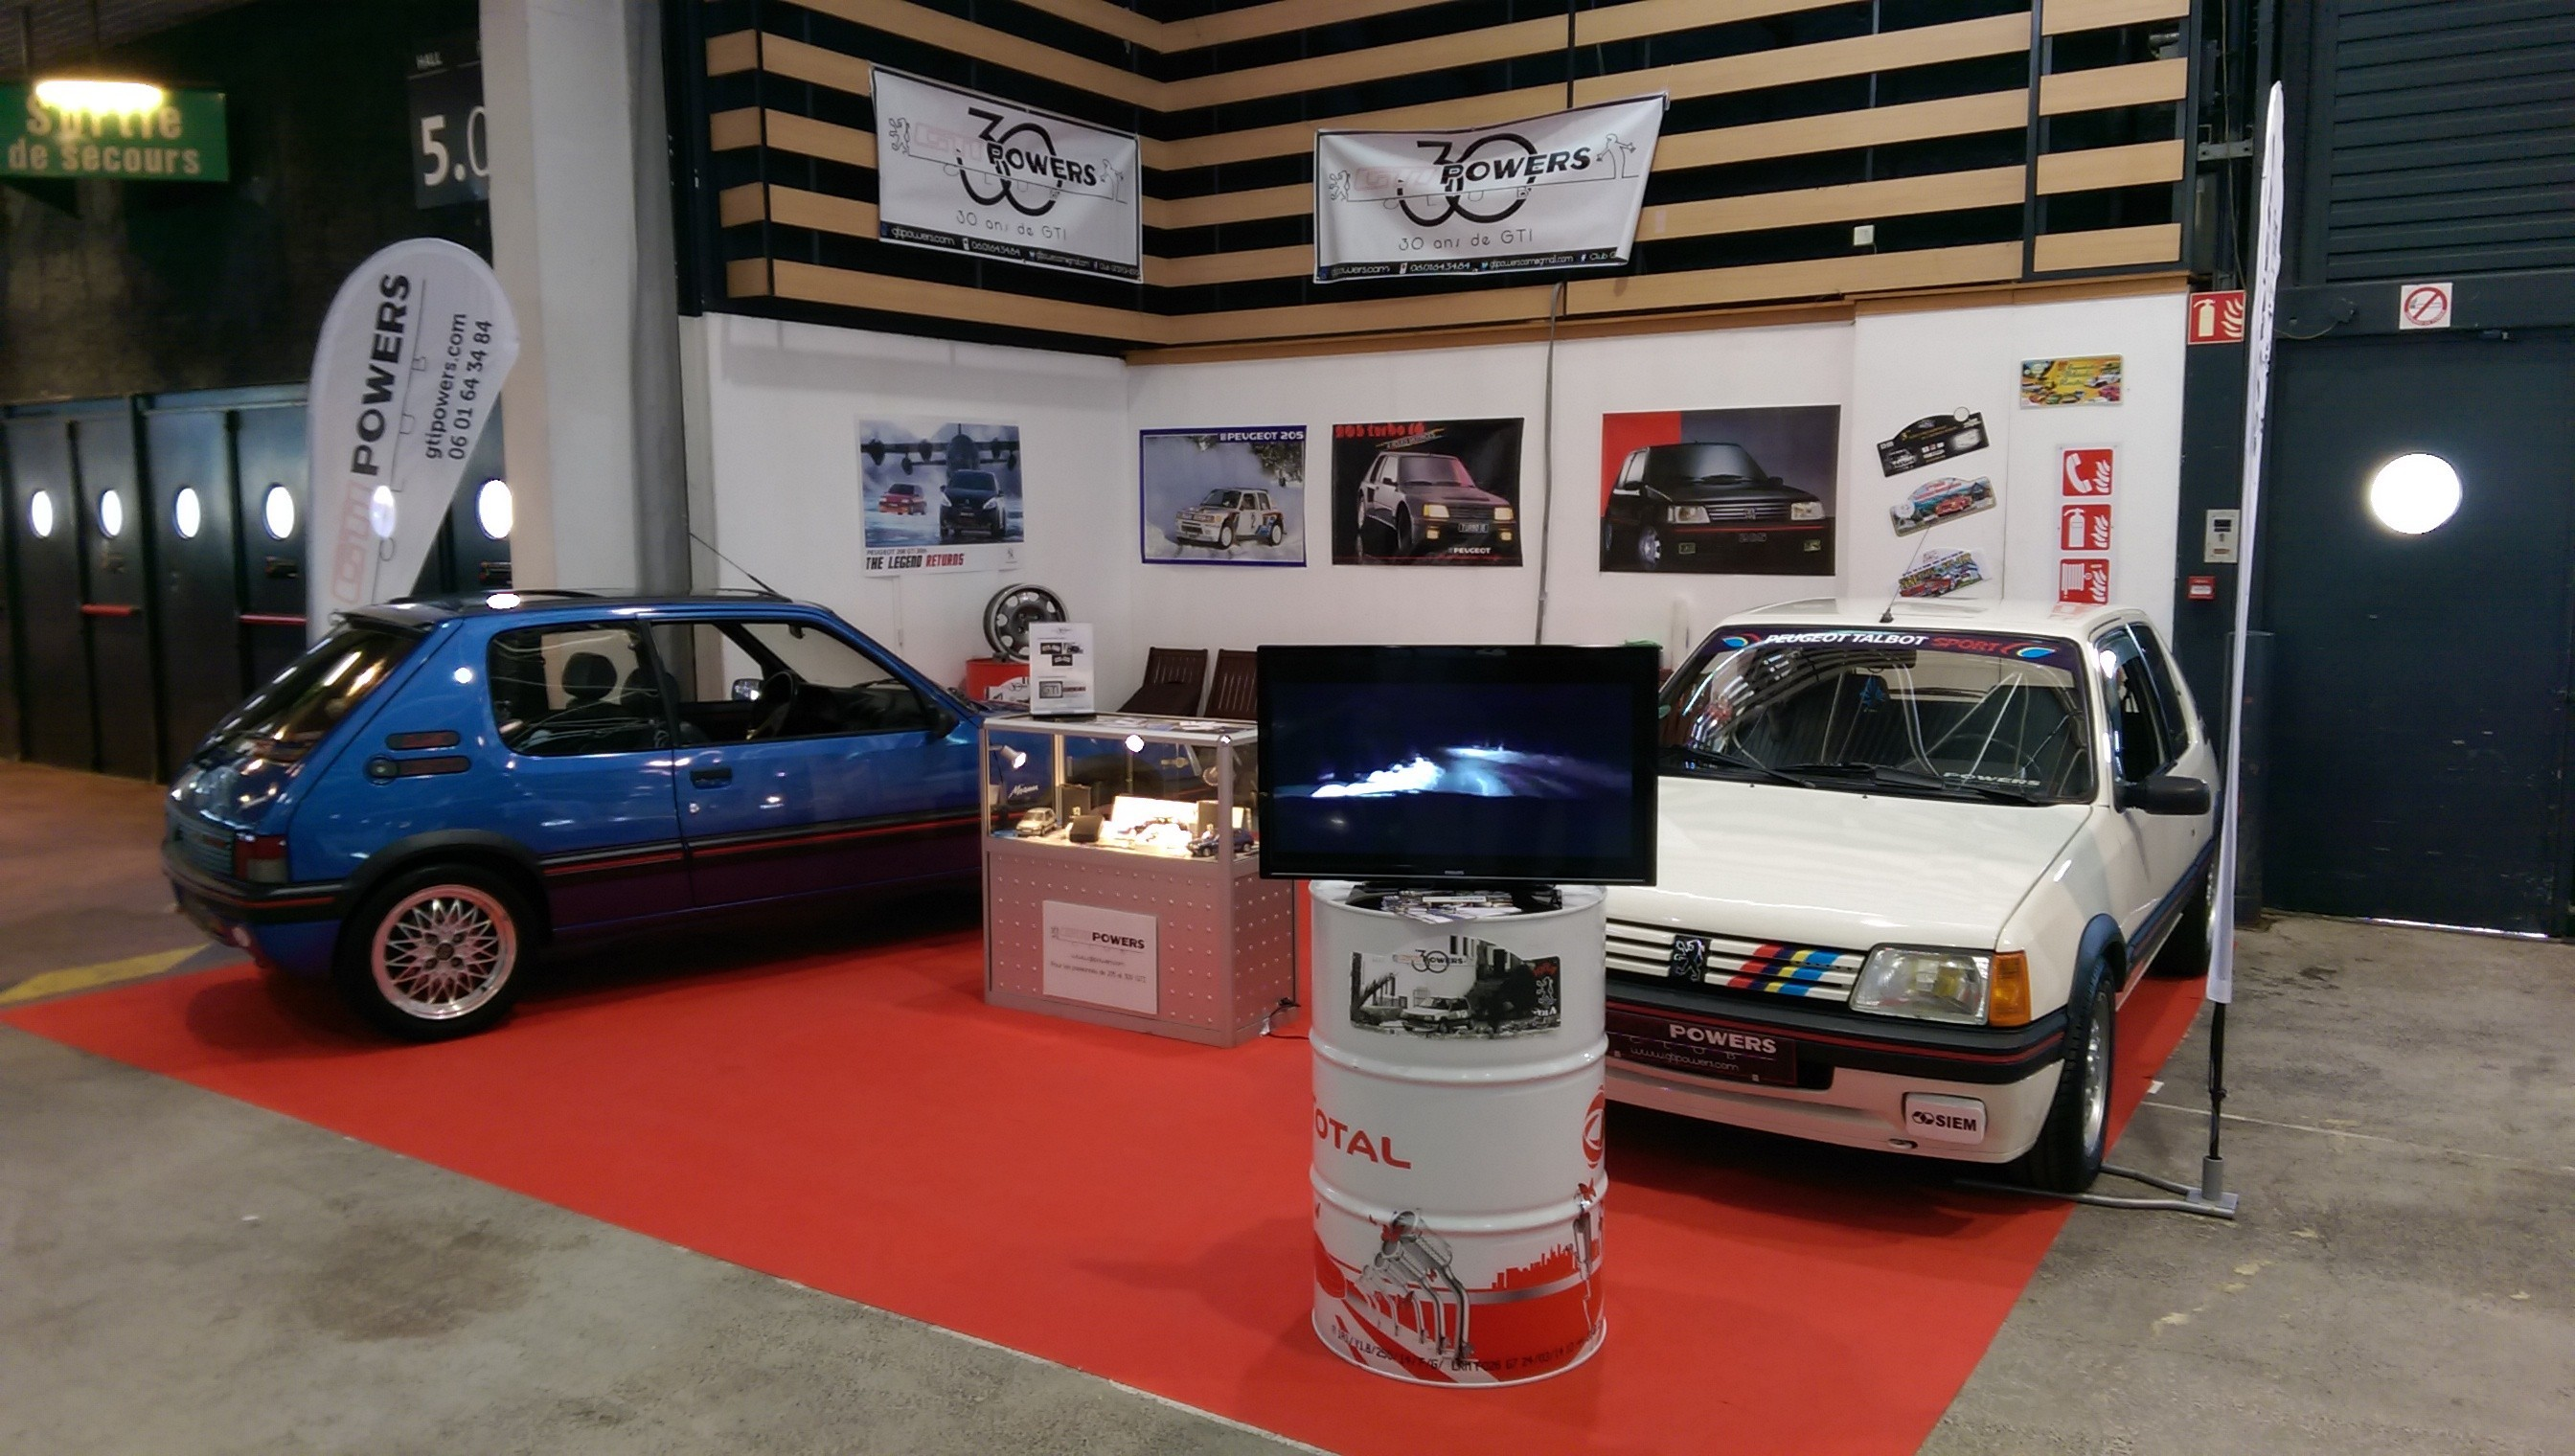 Epoqu'auto - Lyon - 7-8-9 Nov 2014 - Hall 5 Stand Y31 - Page 3 RsvTwT